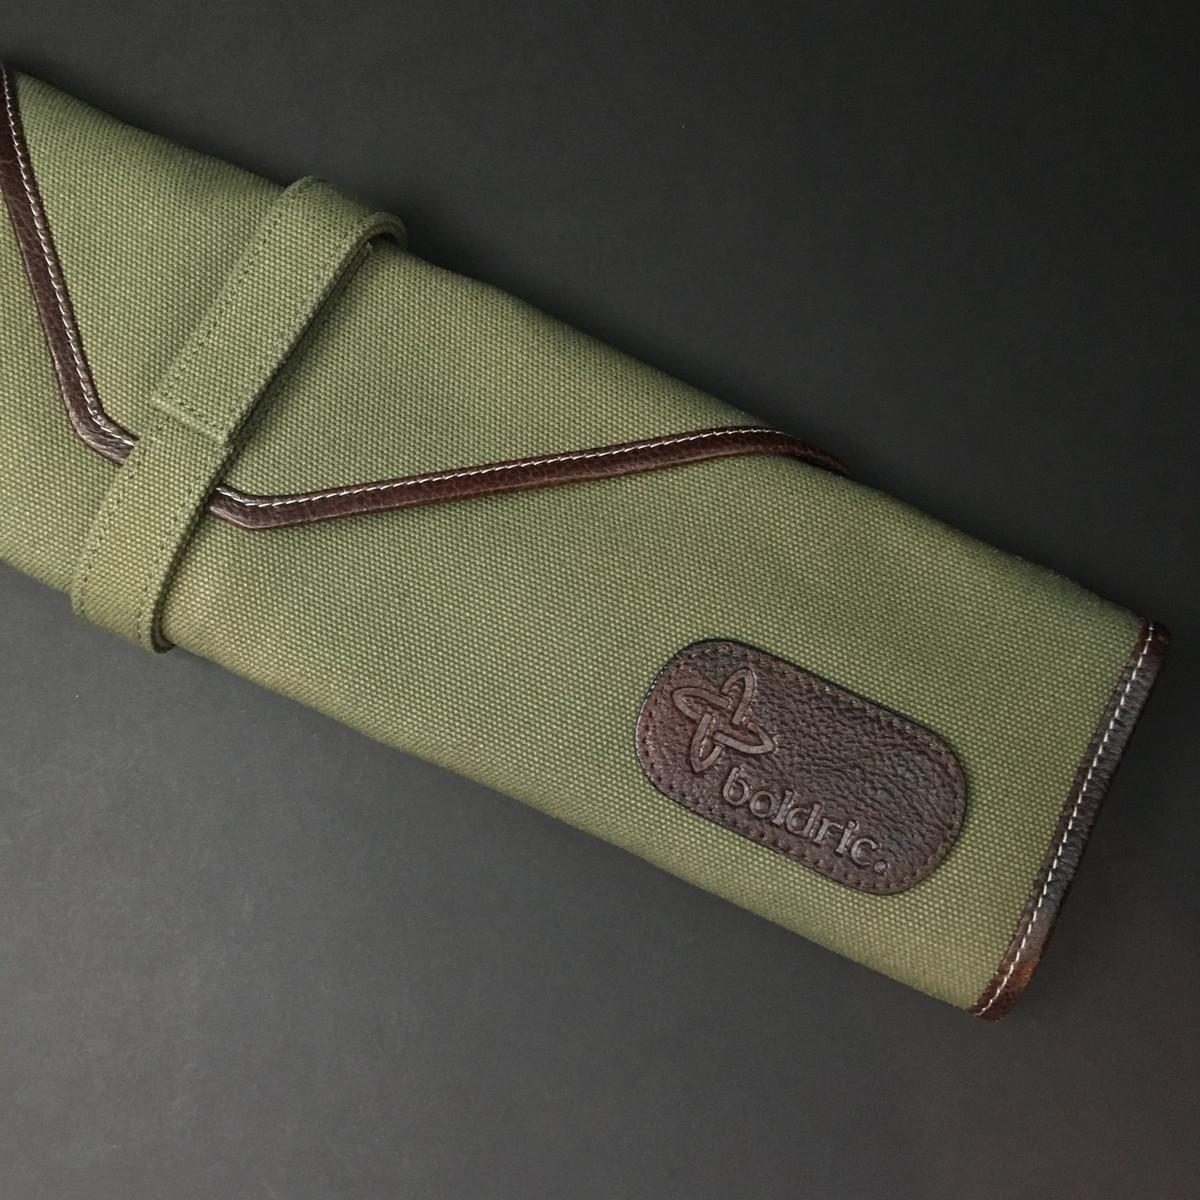 Boldric - 6 pocket - Green